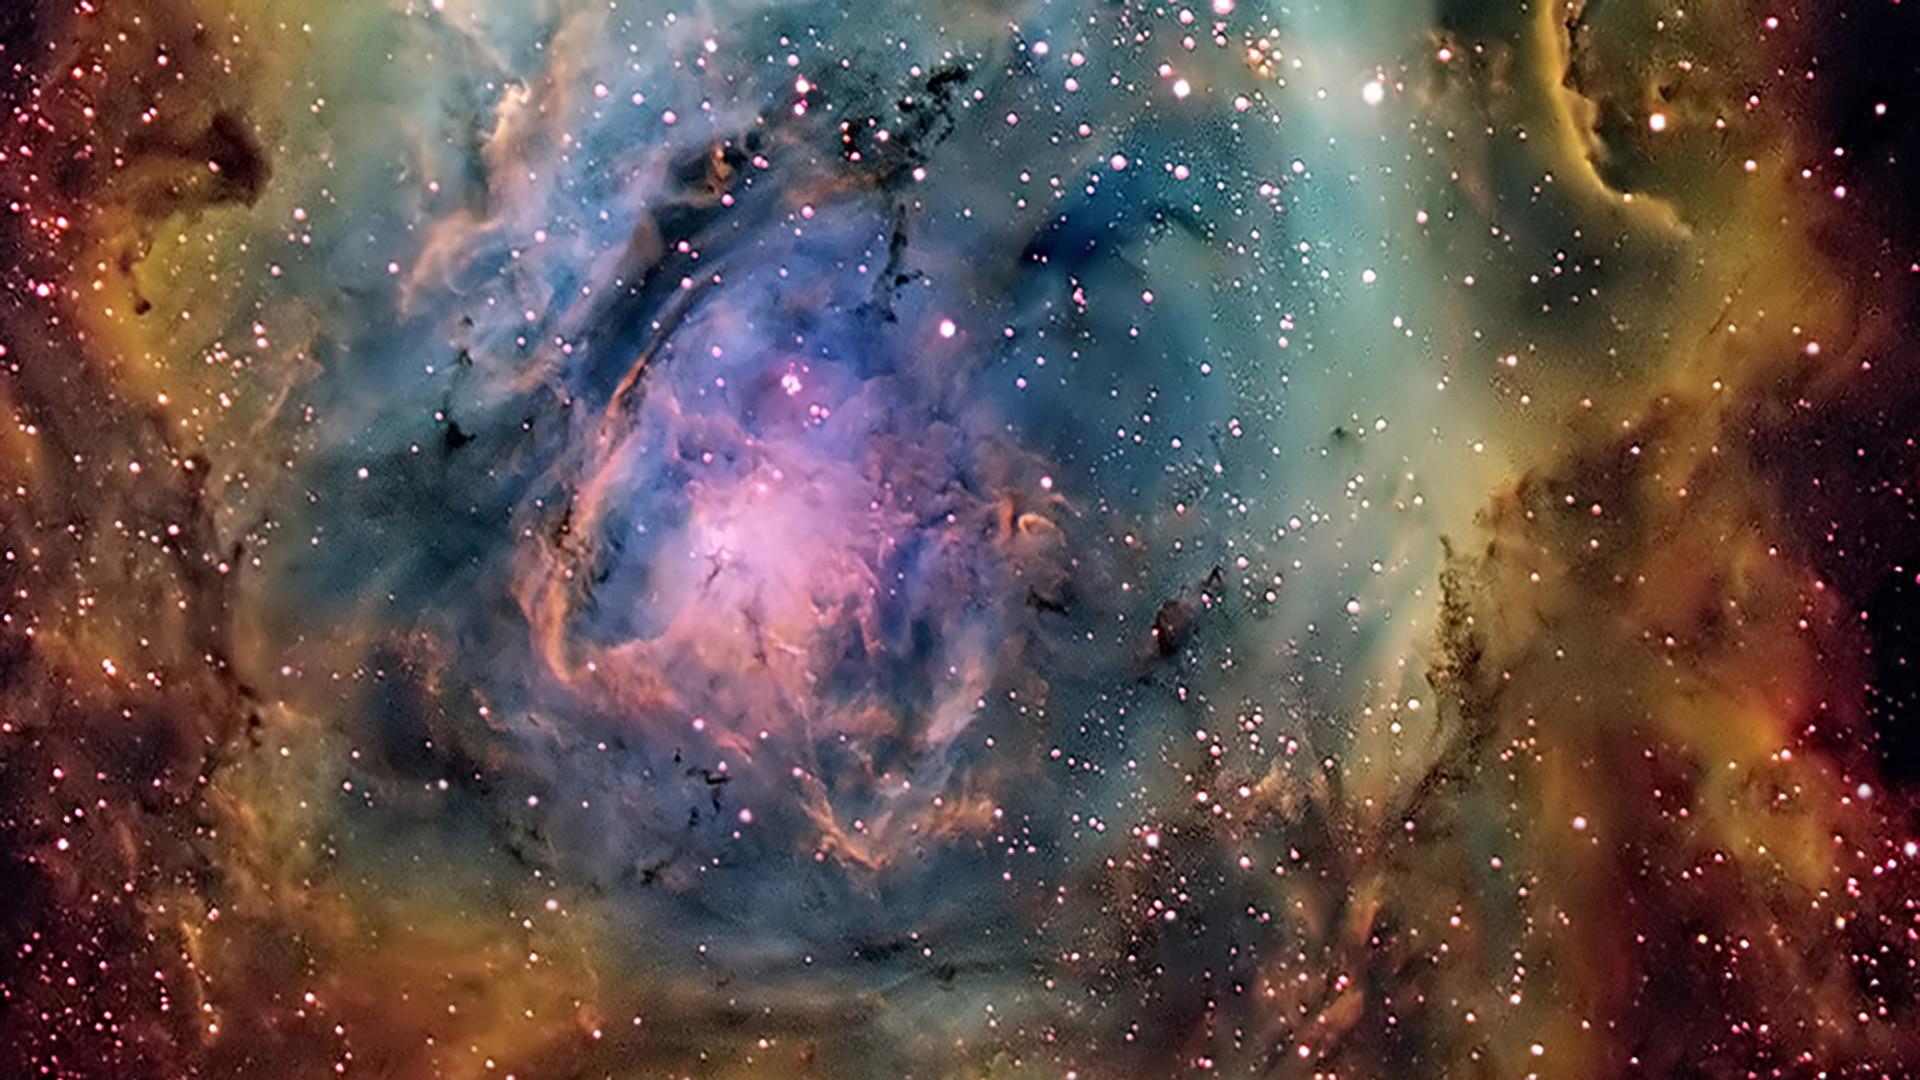 amazing digital space art img7. 1920×1080242286